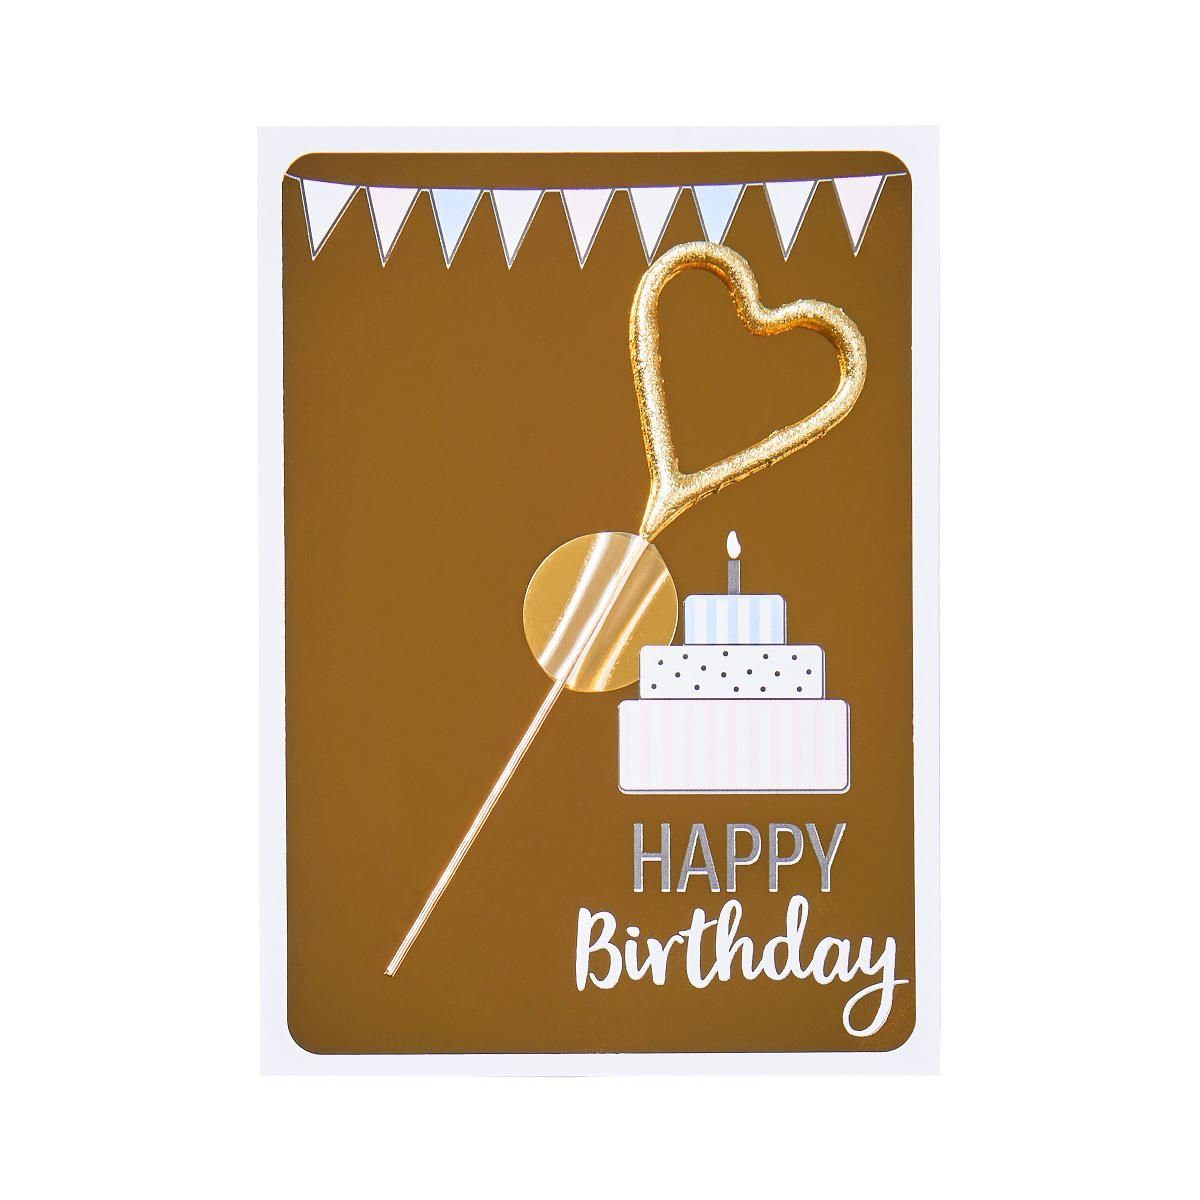 BUTLERS MAGIC MOMENTS »Mini-Grußkarte Happy Birthday mit Wunderkerze«